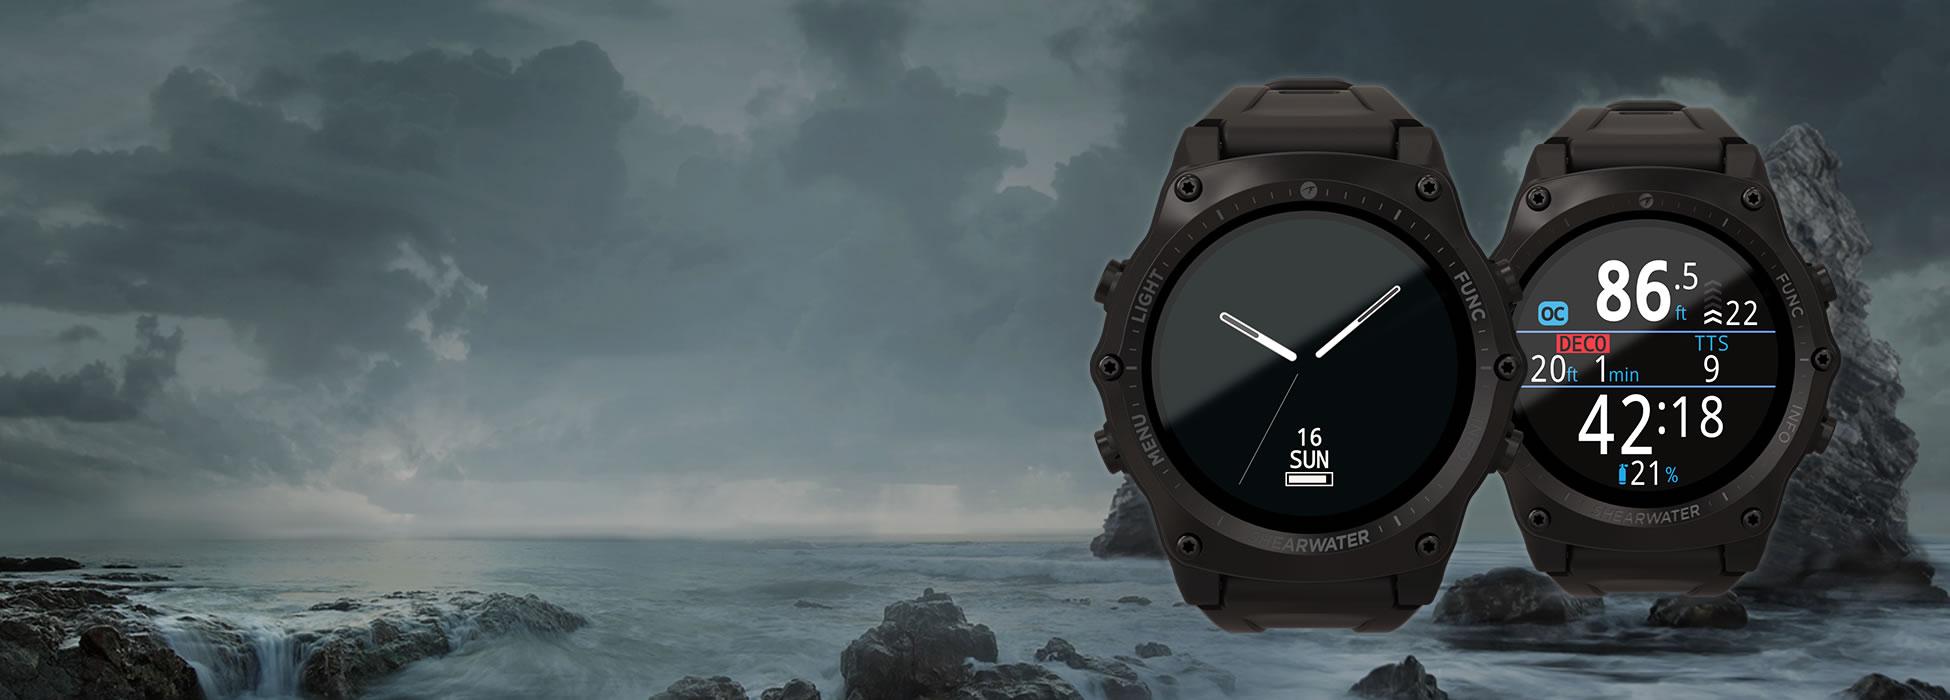 Shearwater Teric 潛水電腦錶 | 改變您對潛水的概念,輕鬆探索水下世界。 |  強大、簡單、可靠